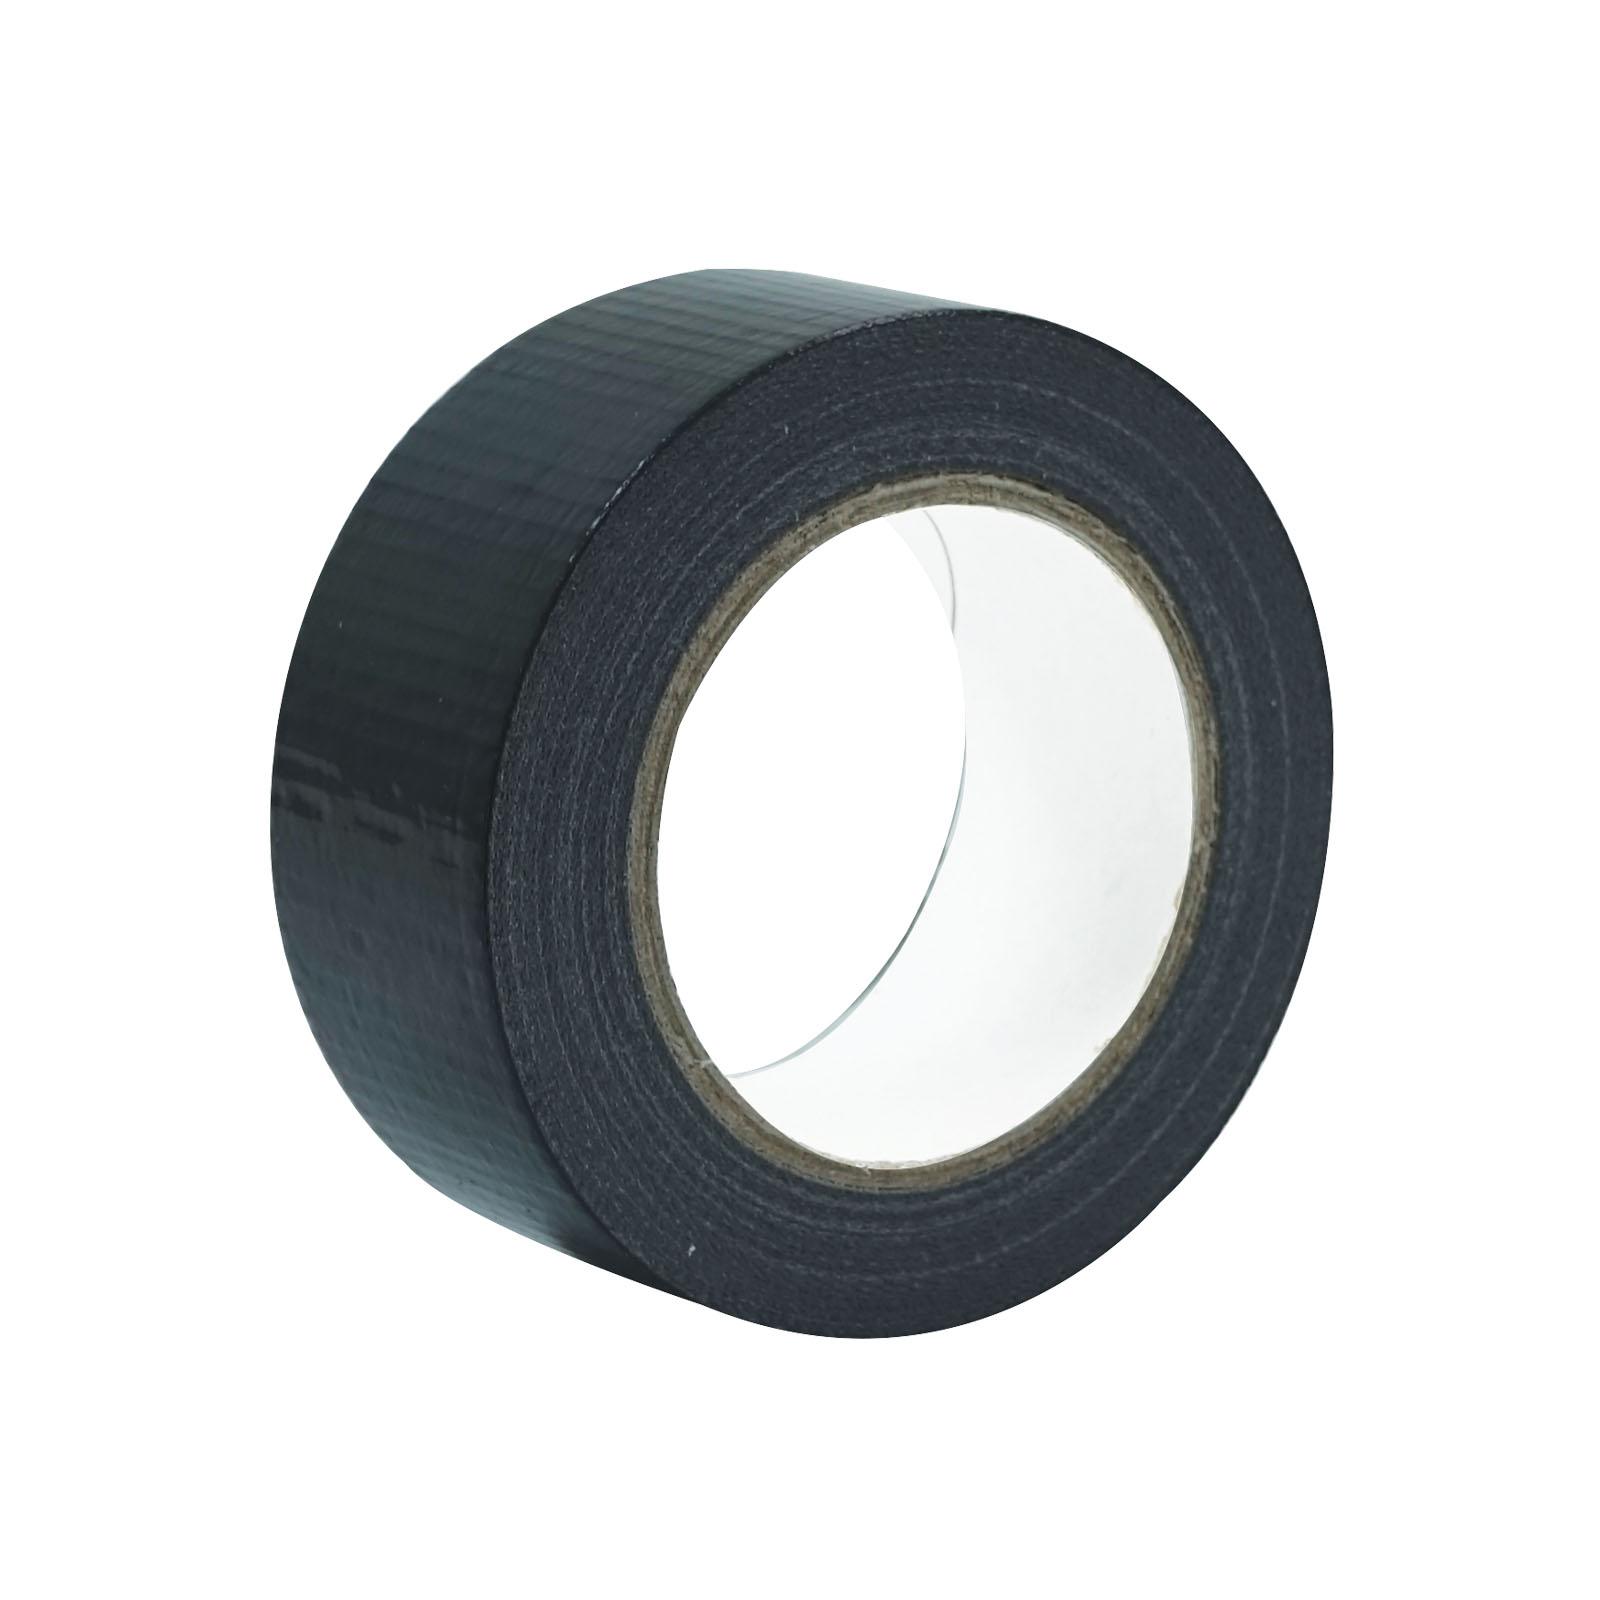 A roll of Black Economy Cloth Gaffer Tape 48mm